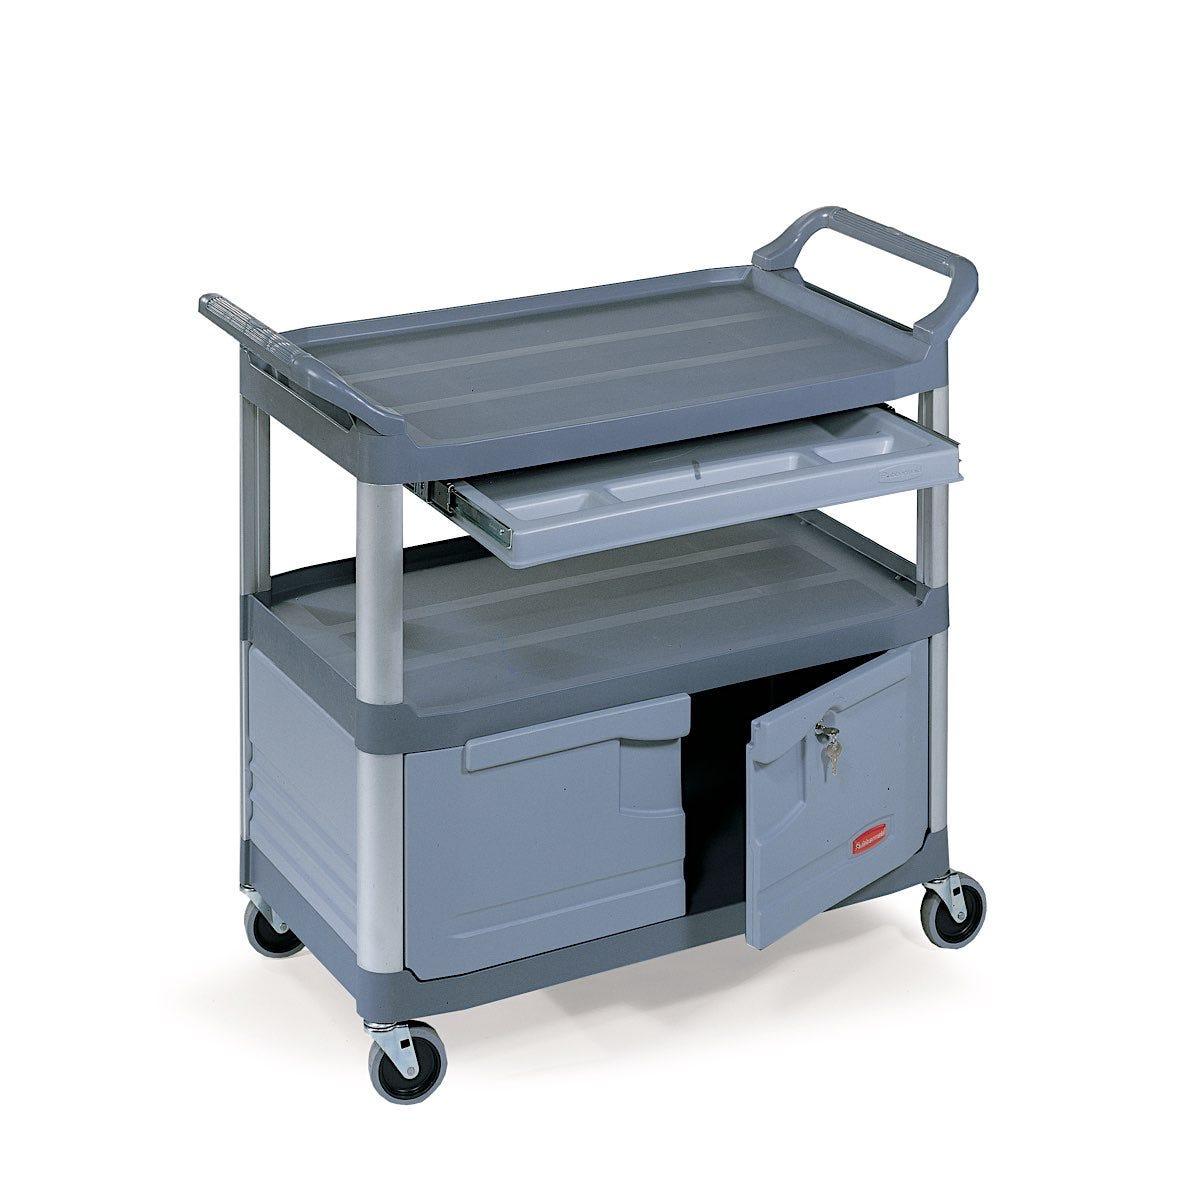 Rubbermaid Instrument Cart, Gray